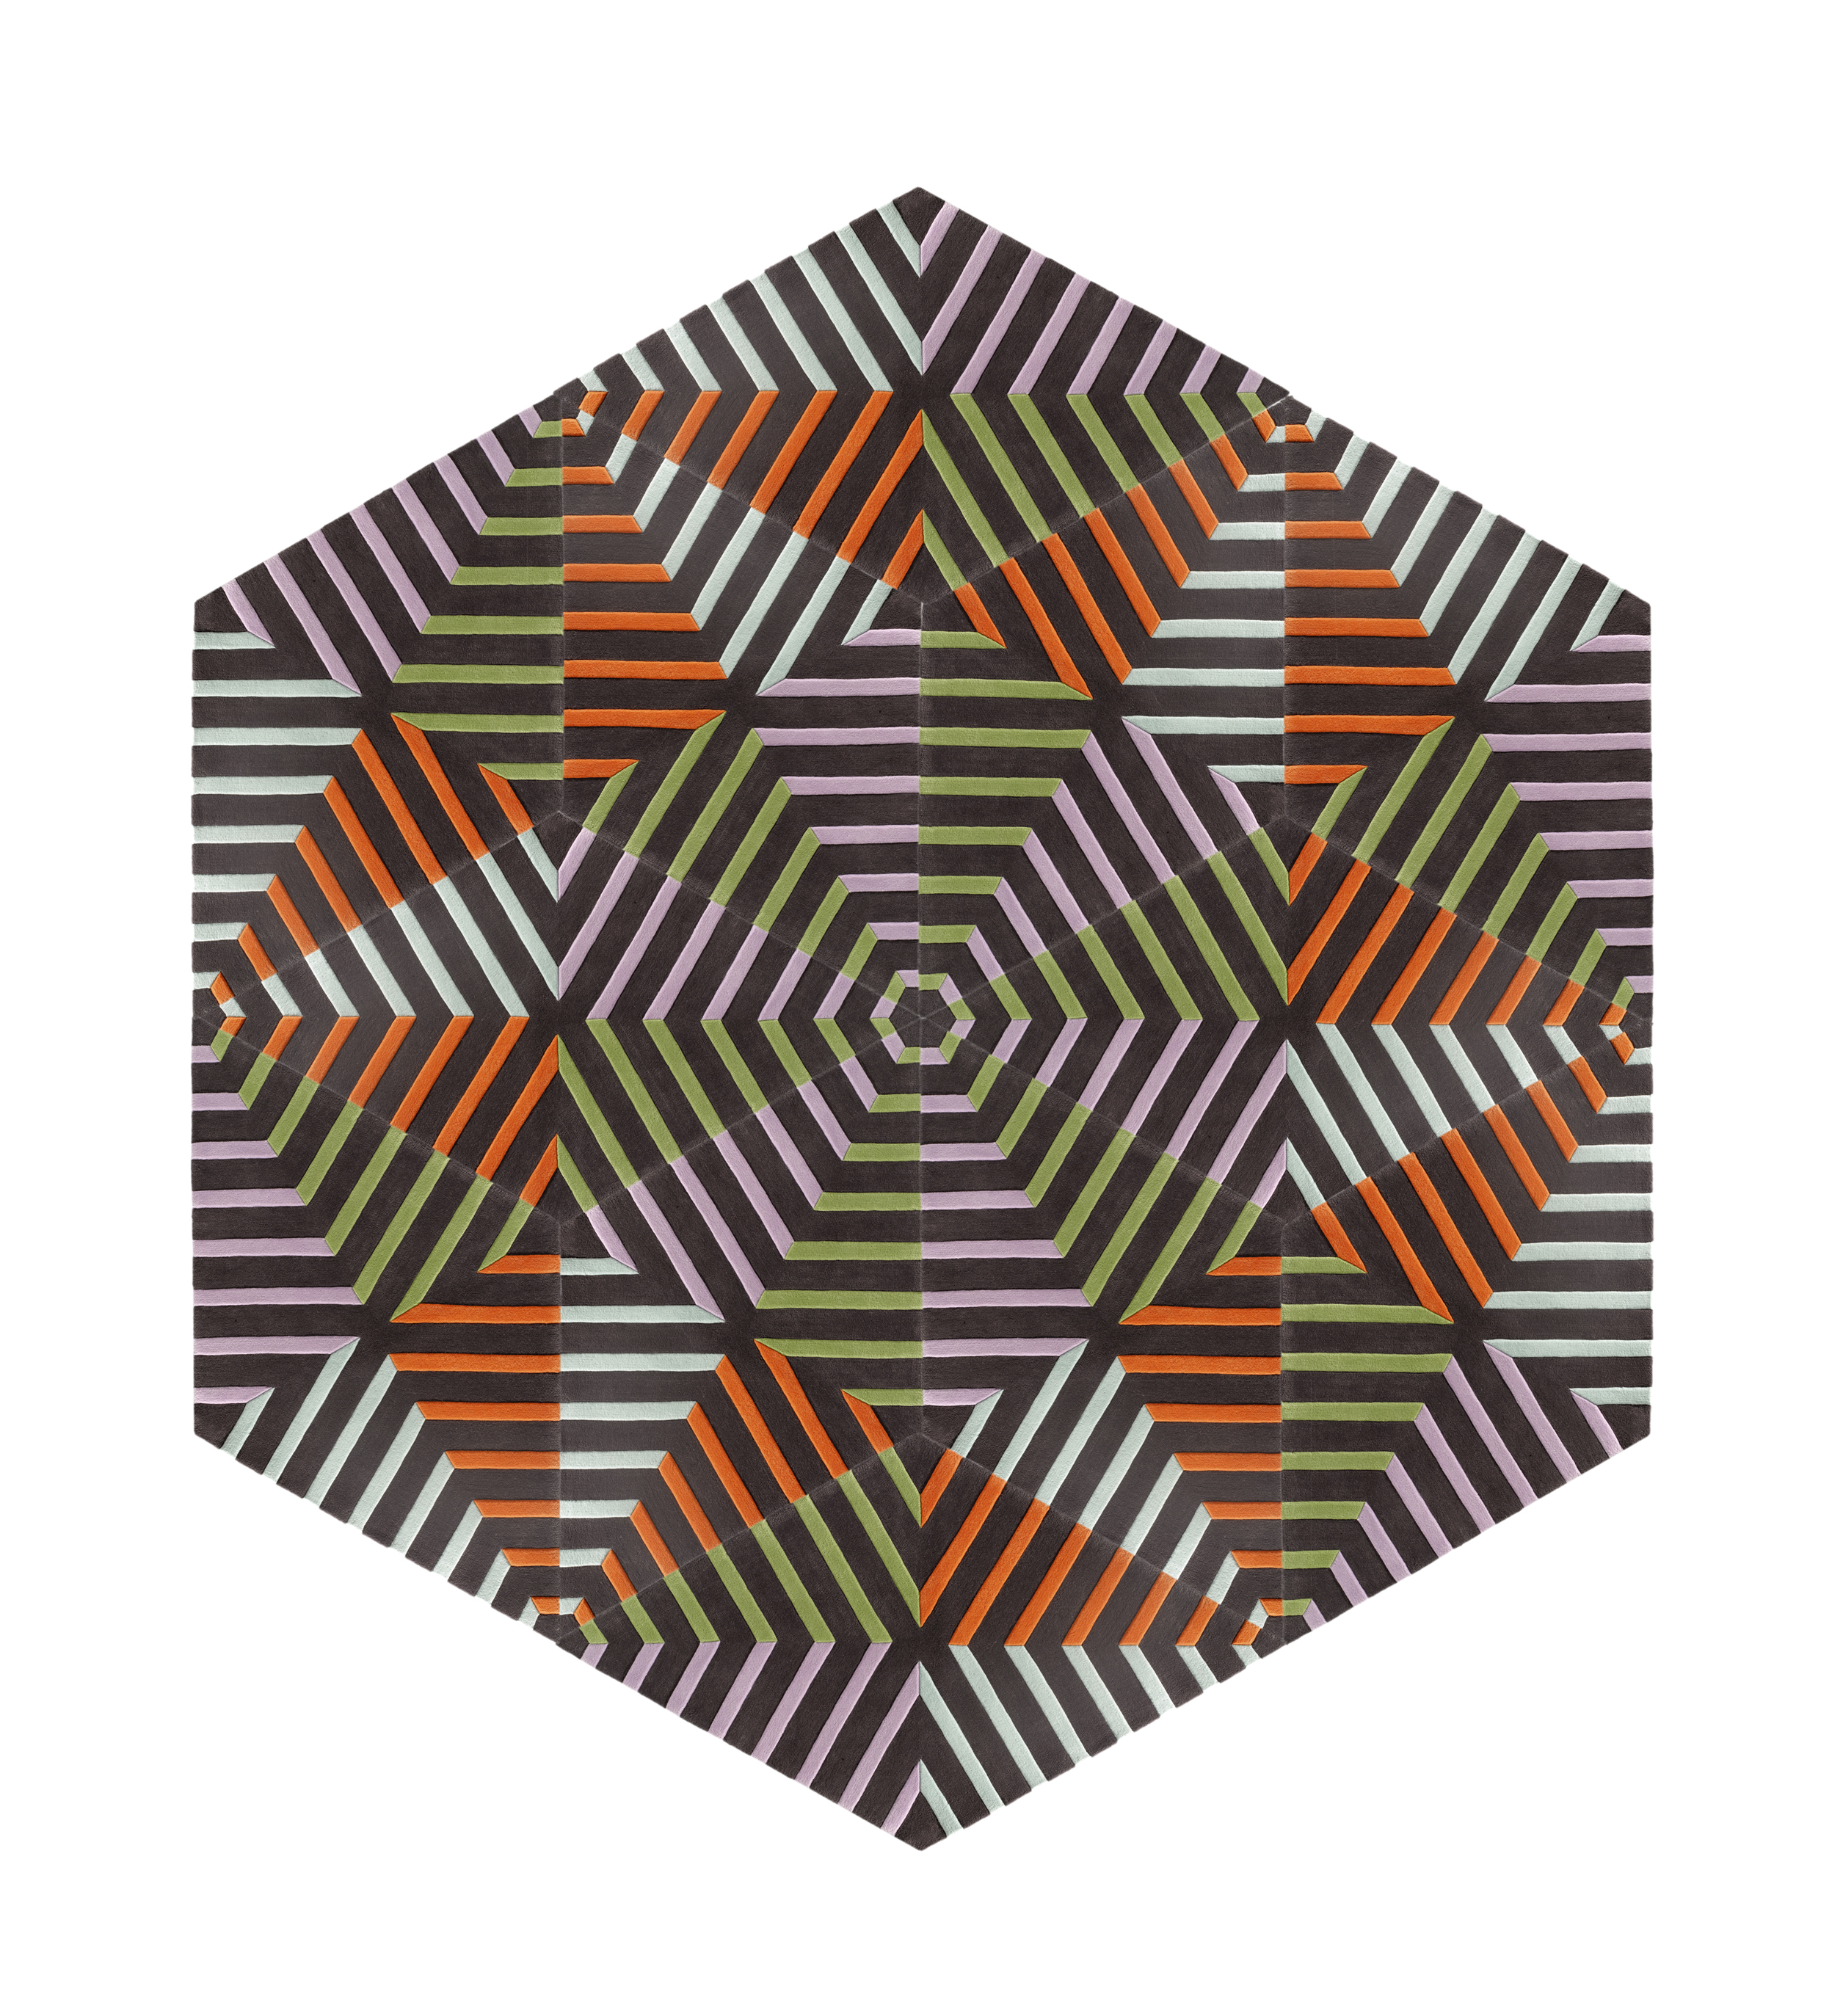 Star   Style: Thunder Zebra  Quantity: 12Diamonds  Measures: 12' w x 10'4'' h  Cost: $6,000 USD